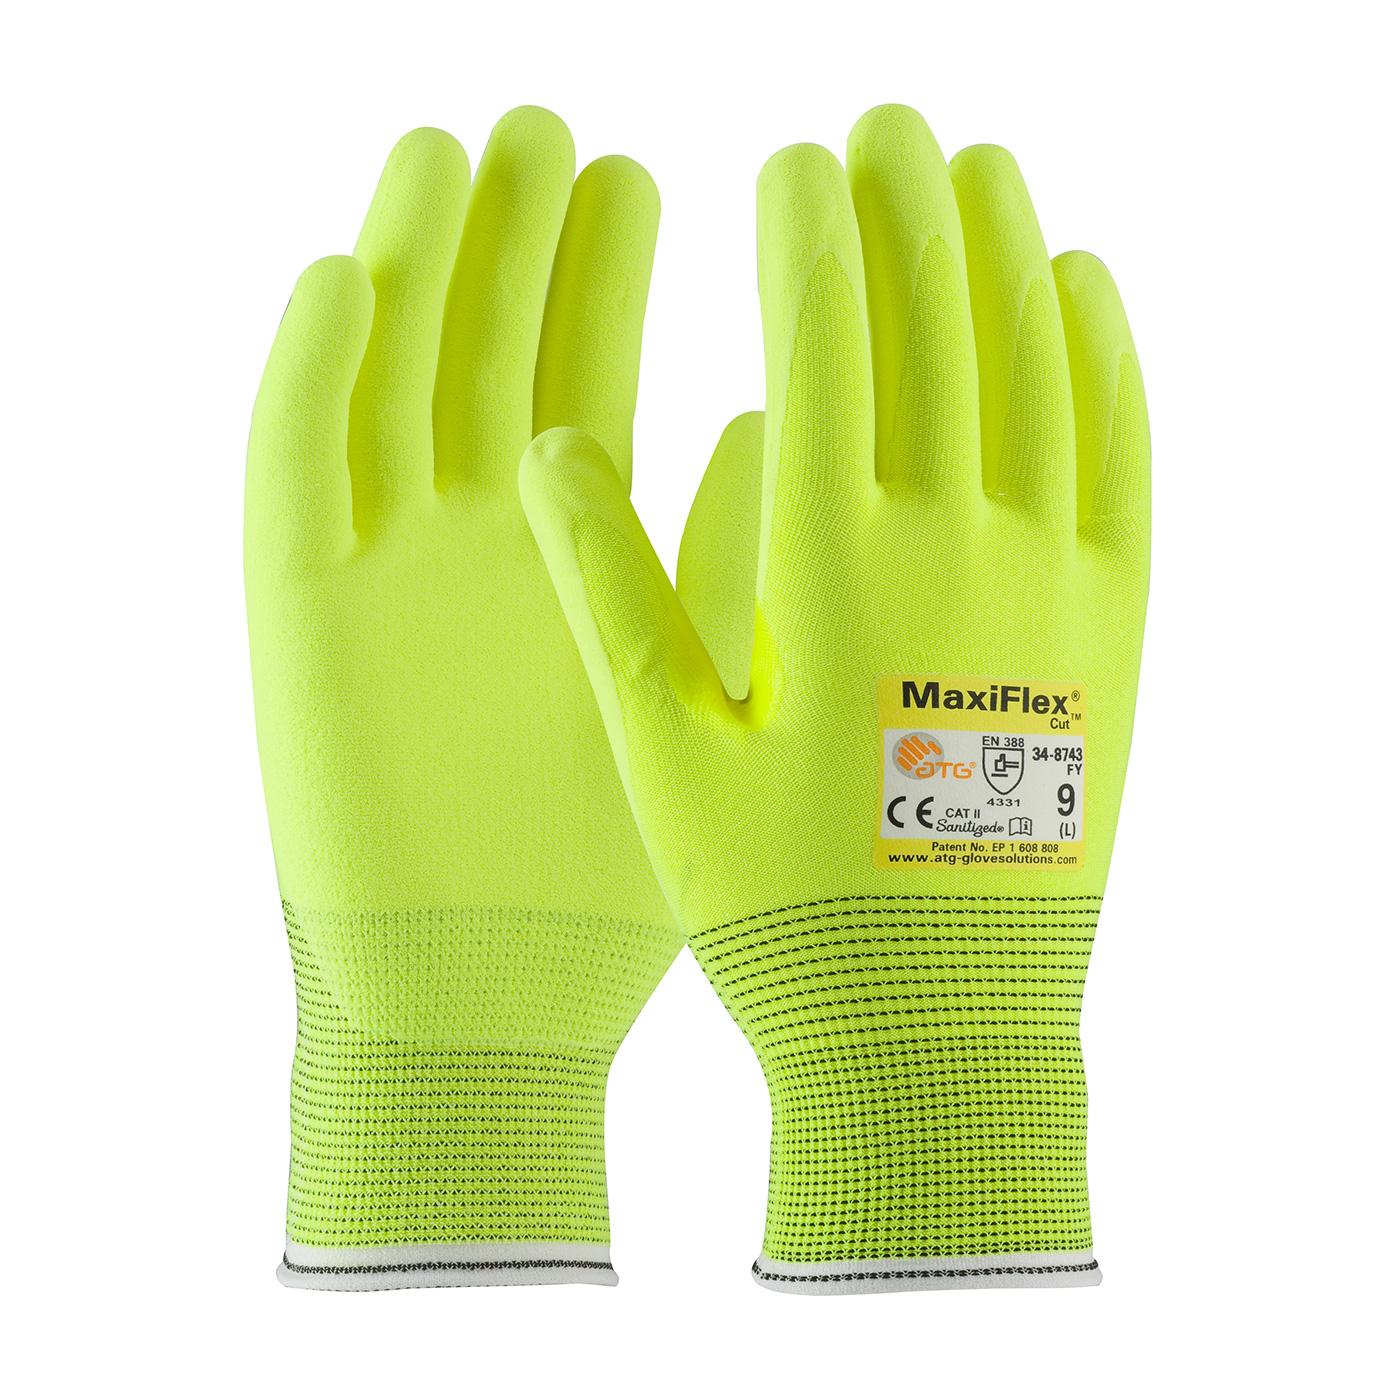 Maxiflex 174 Cut Seamless Knit Engineered Yarn Glove With